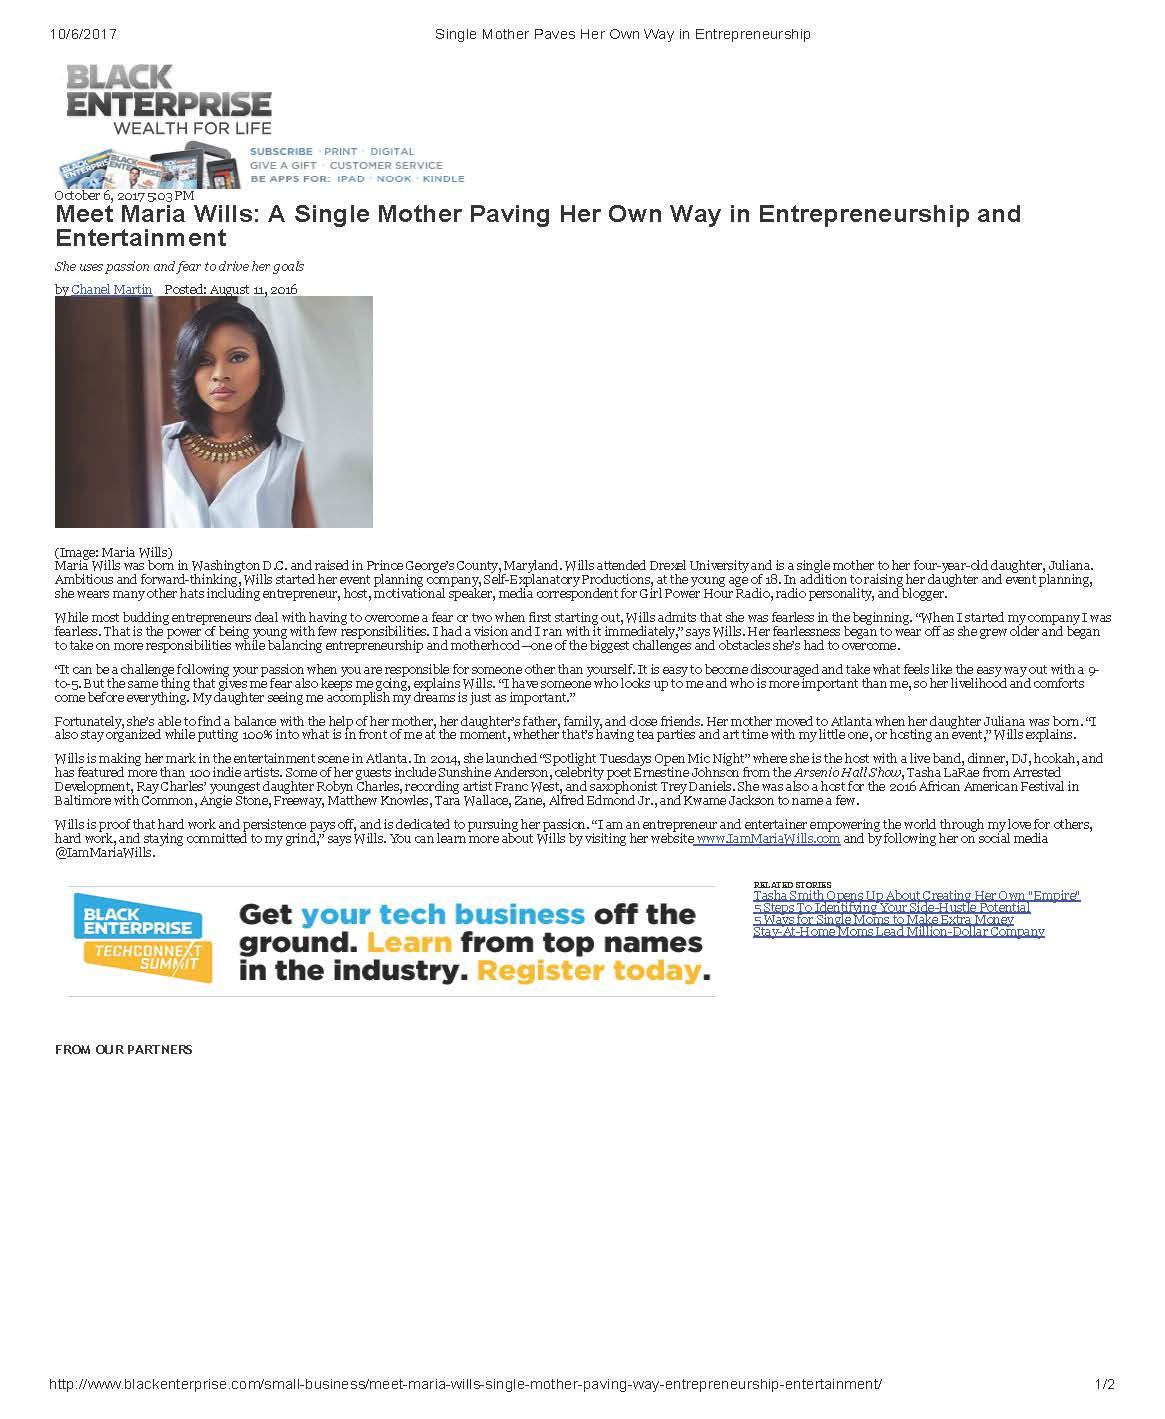 Black Enterprise Single Mother Paves Her Own Way in Entrepreneurship_Page_1.jpg